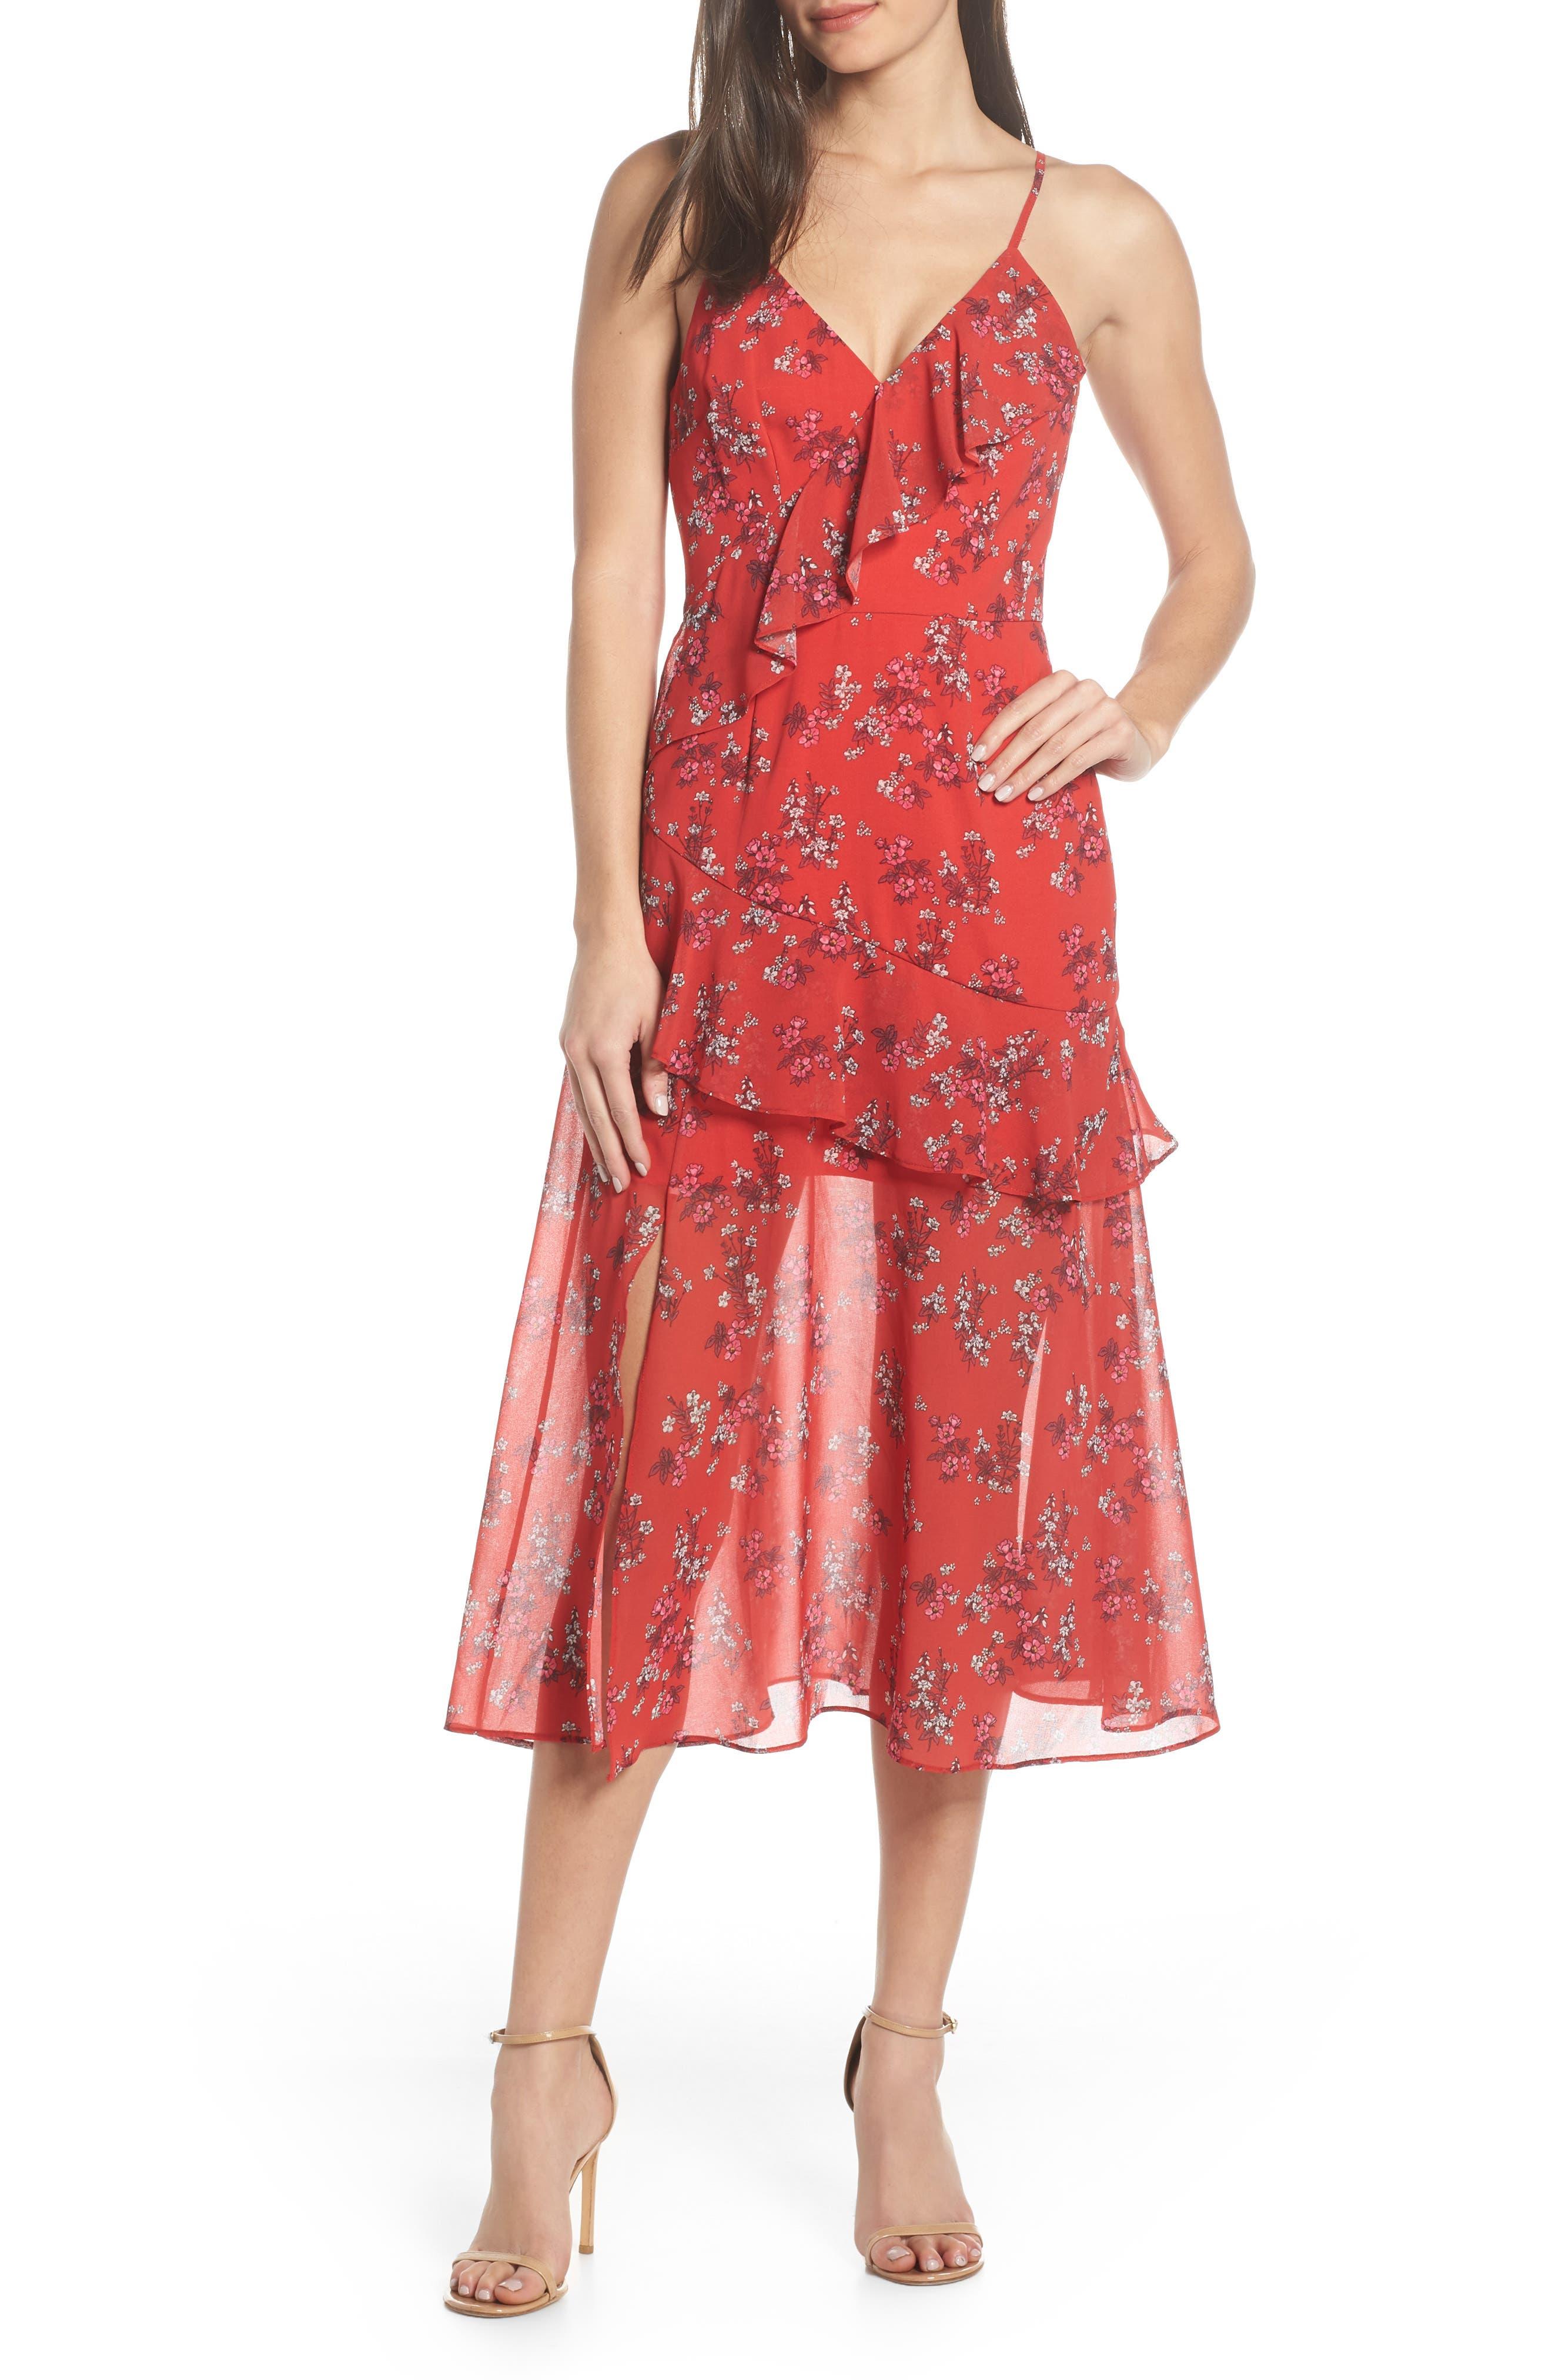 Keepsake The Label Heart & Soul Ruffle Detail Tea Length Dress, Red